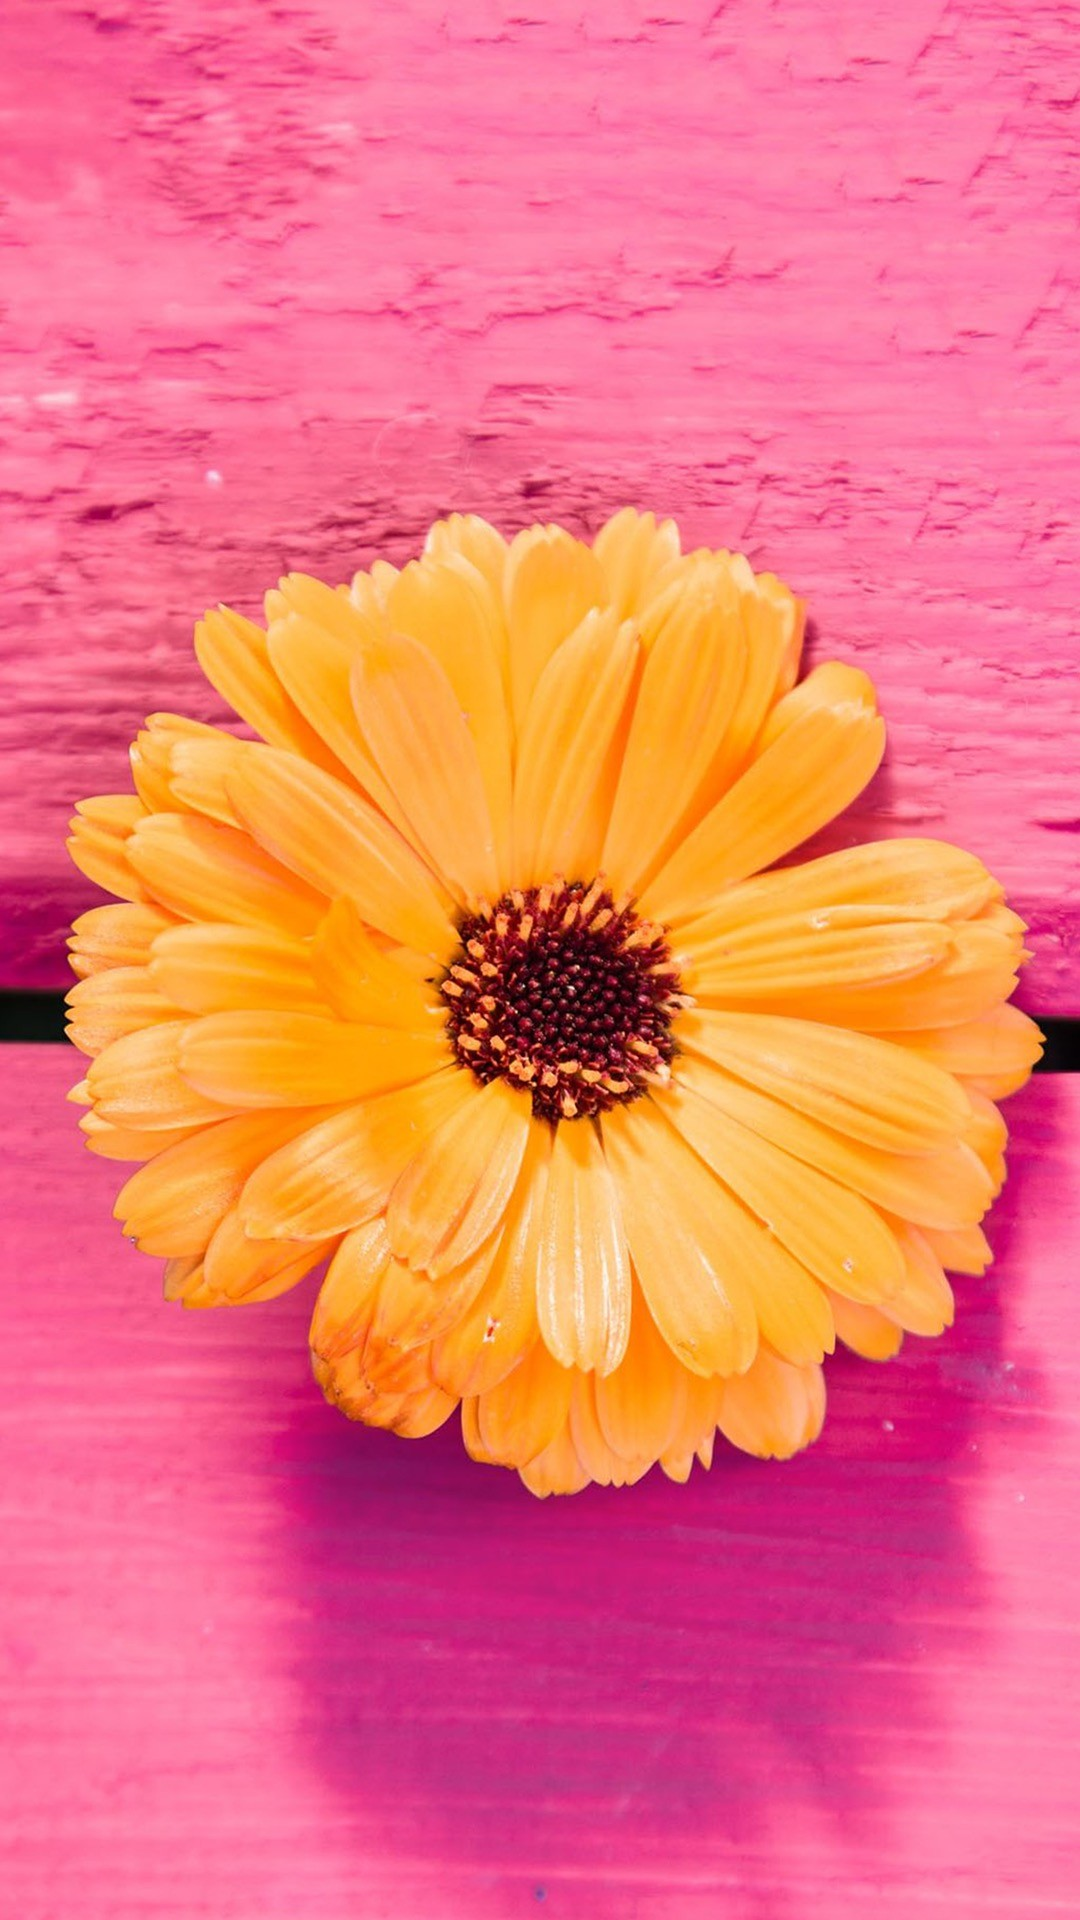 Flowery Wallpaper, Nature Wallpaper, Wallpaper Ideas, Pink Wallpaper Iphone,  Orange Wallpaper, Iphone Backgrounds, Wallpaper Backgrounds, Iphone  Wallpapers, …